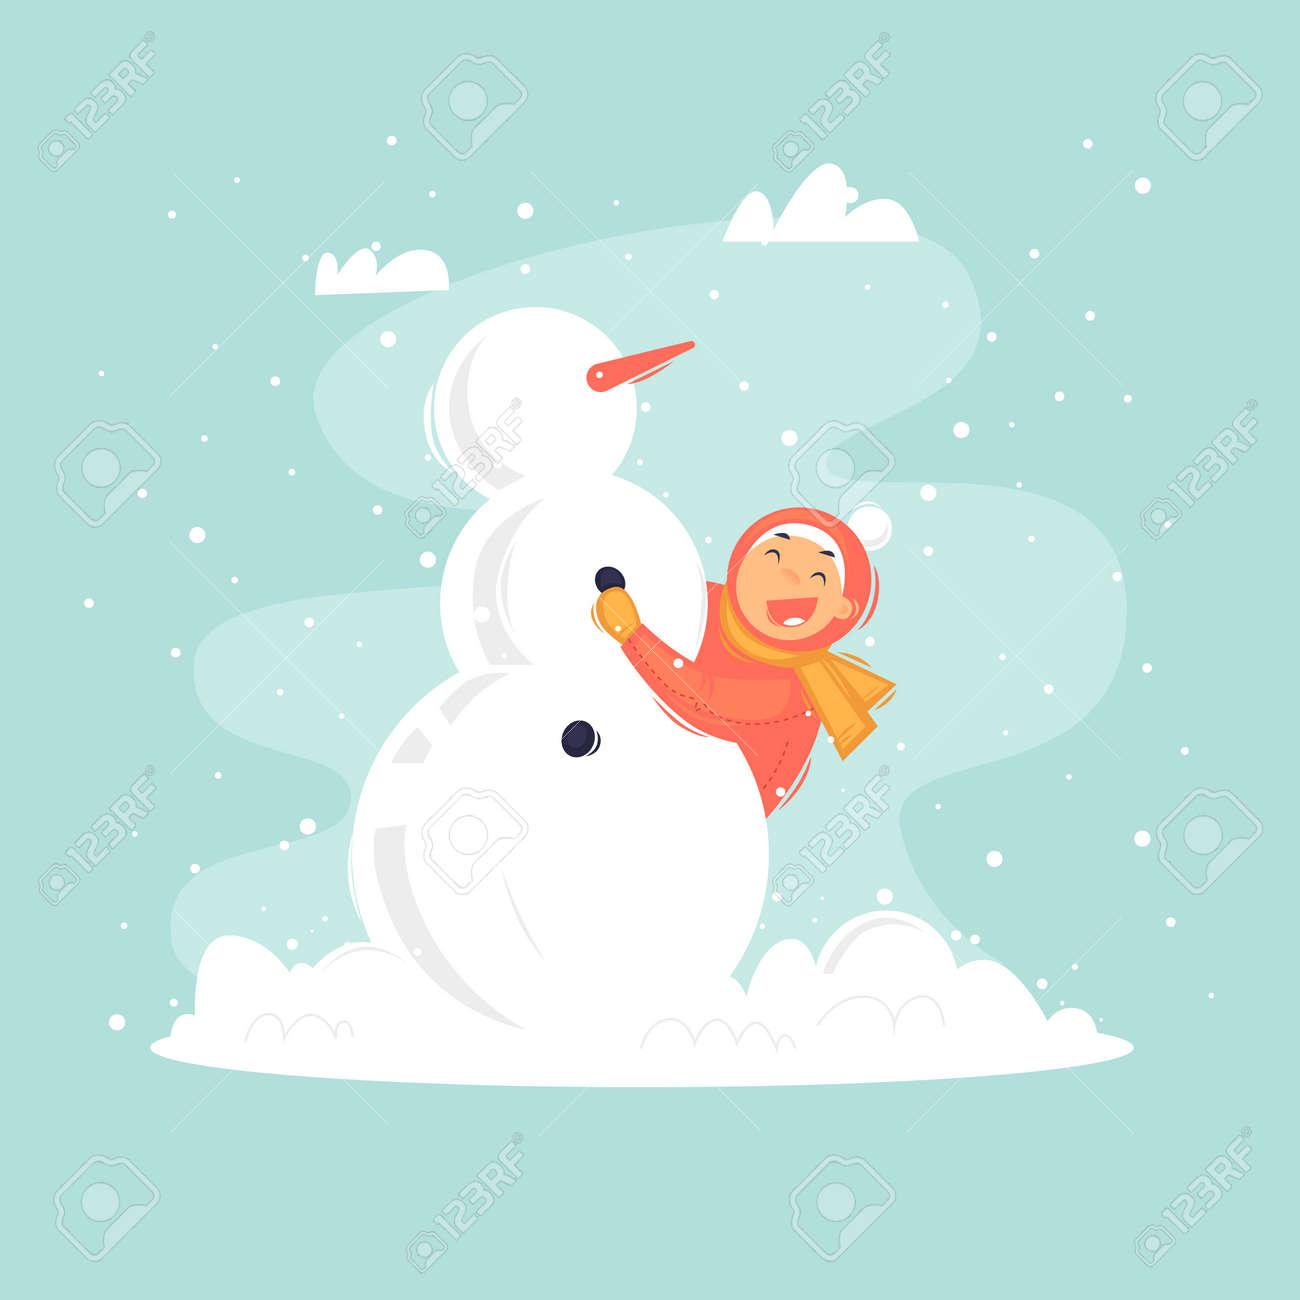 Child sculpts a snowman, winter. Flat vector illustration in cartoon style. - 112582757